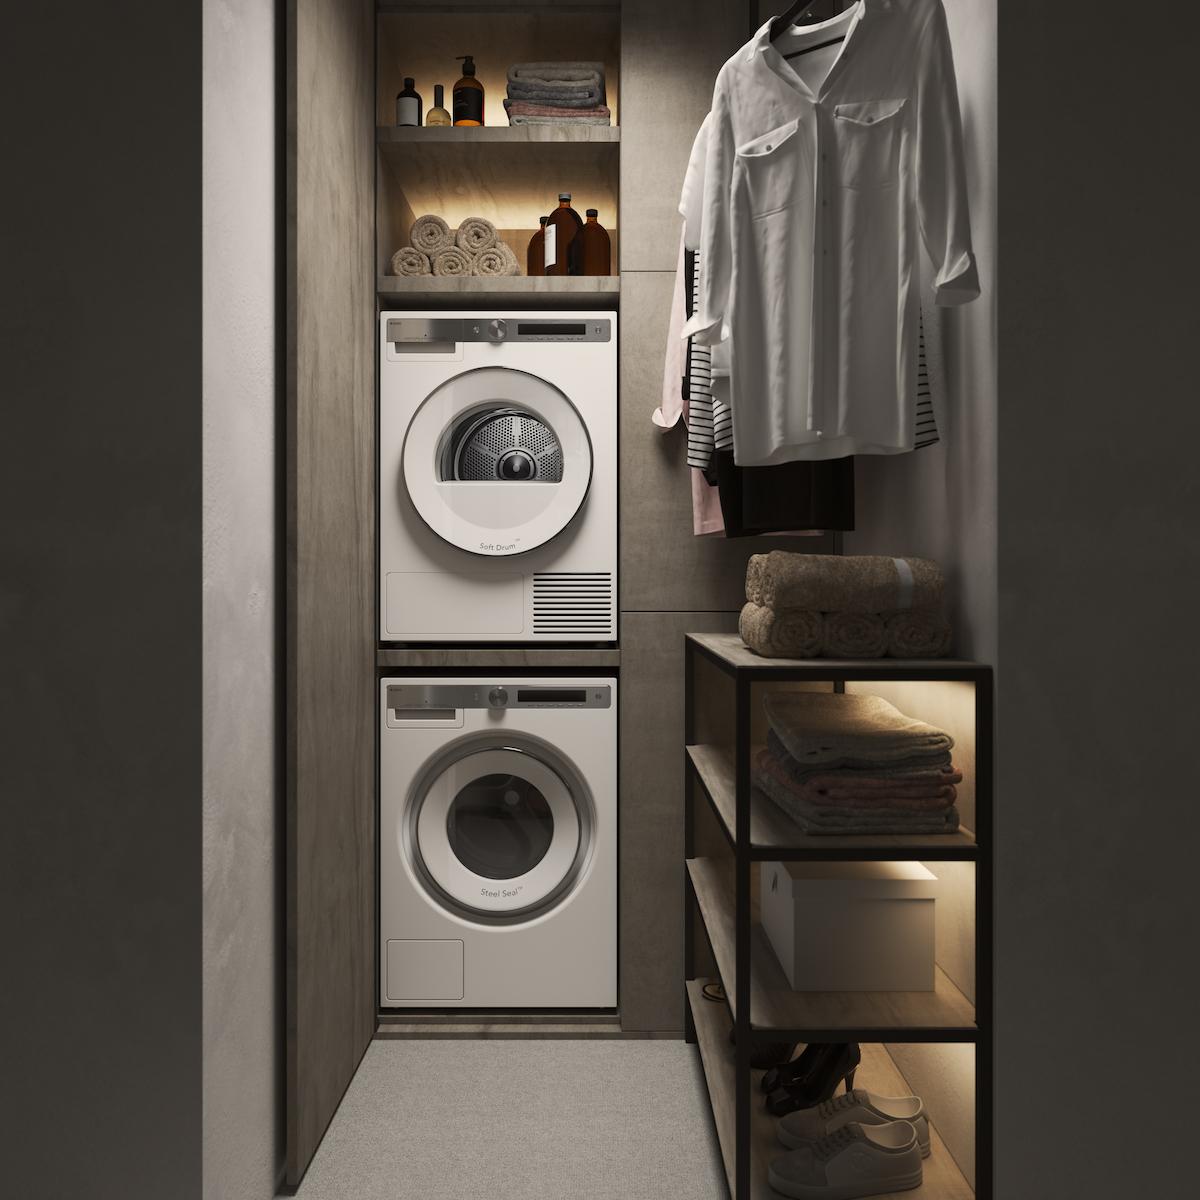 169787_file_print_asko-amb-laundry-LaundryRoom_smallFlat_s_Style_w_Final